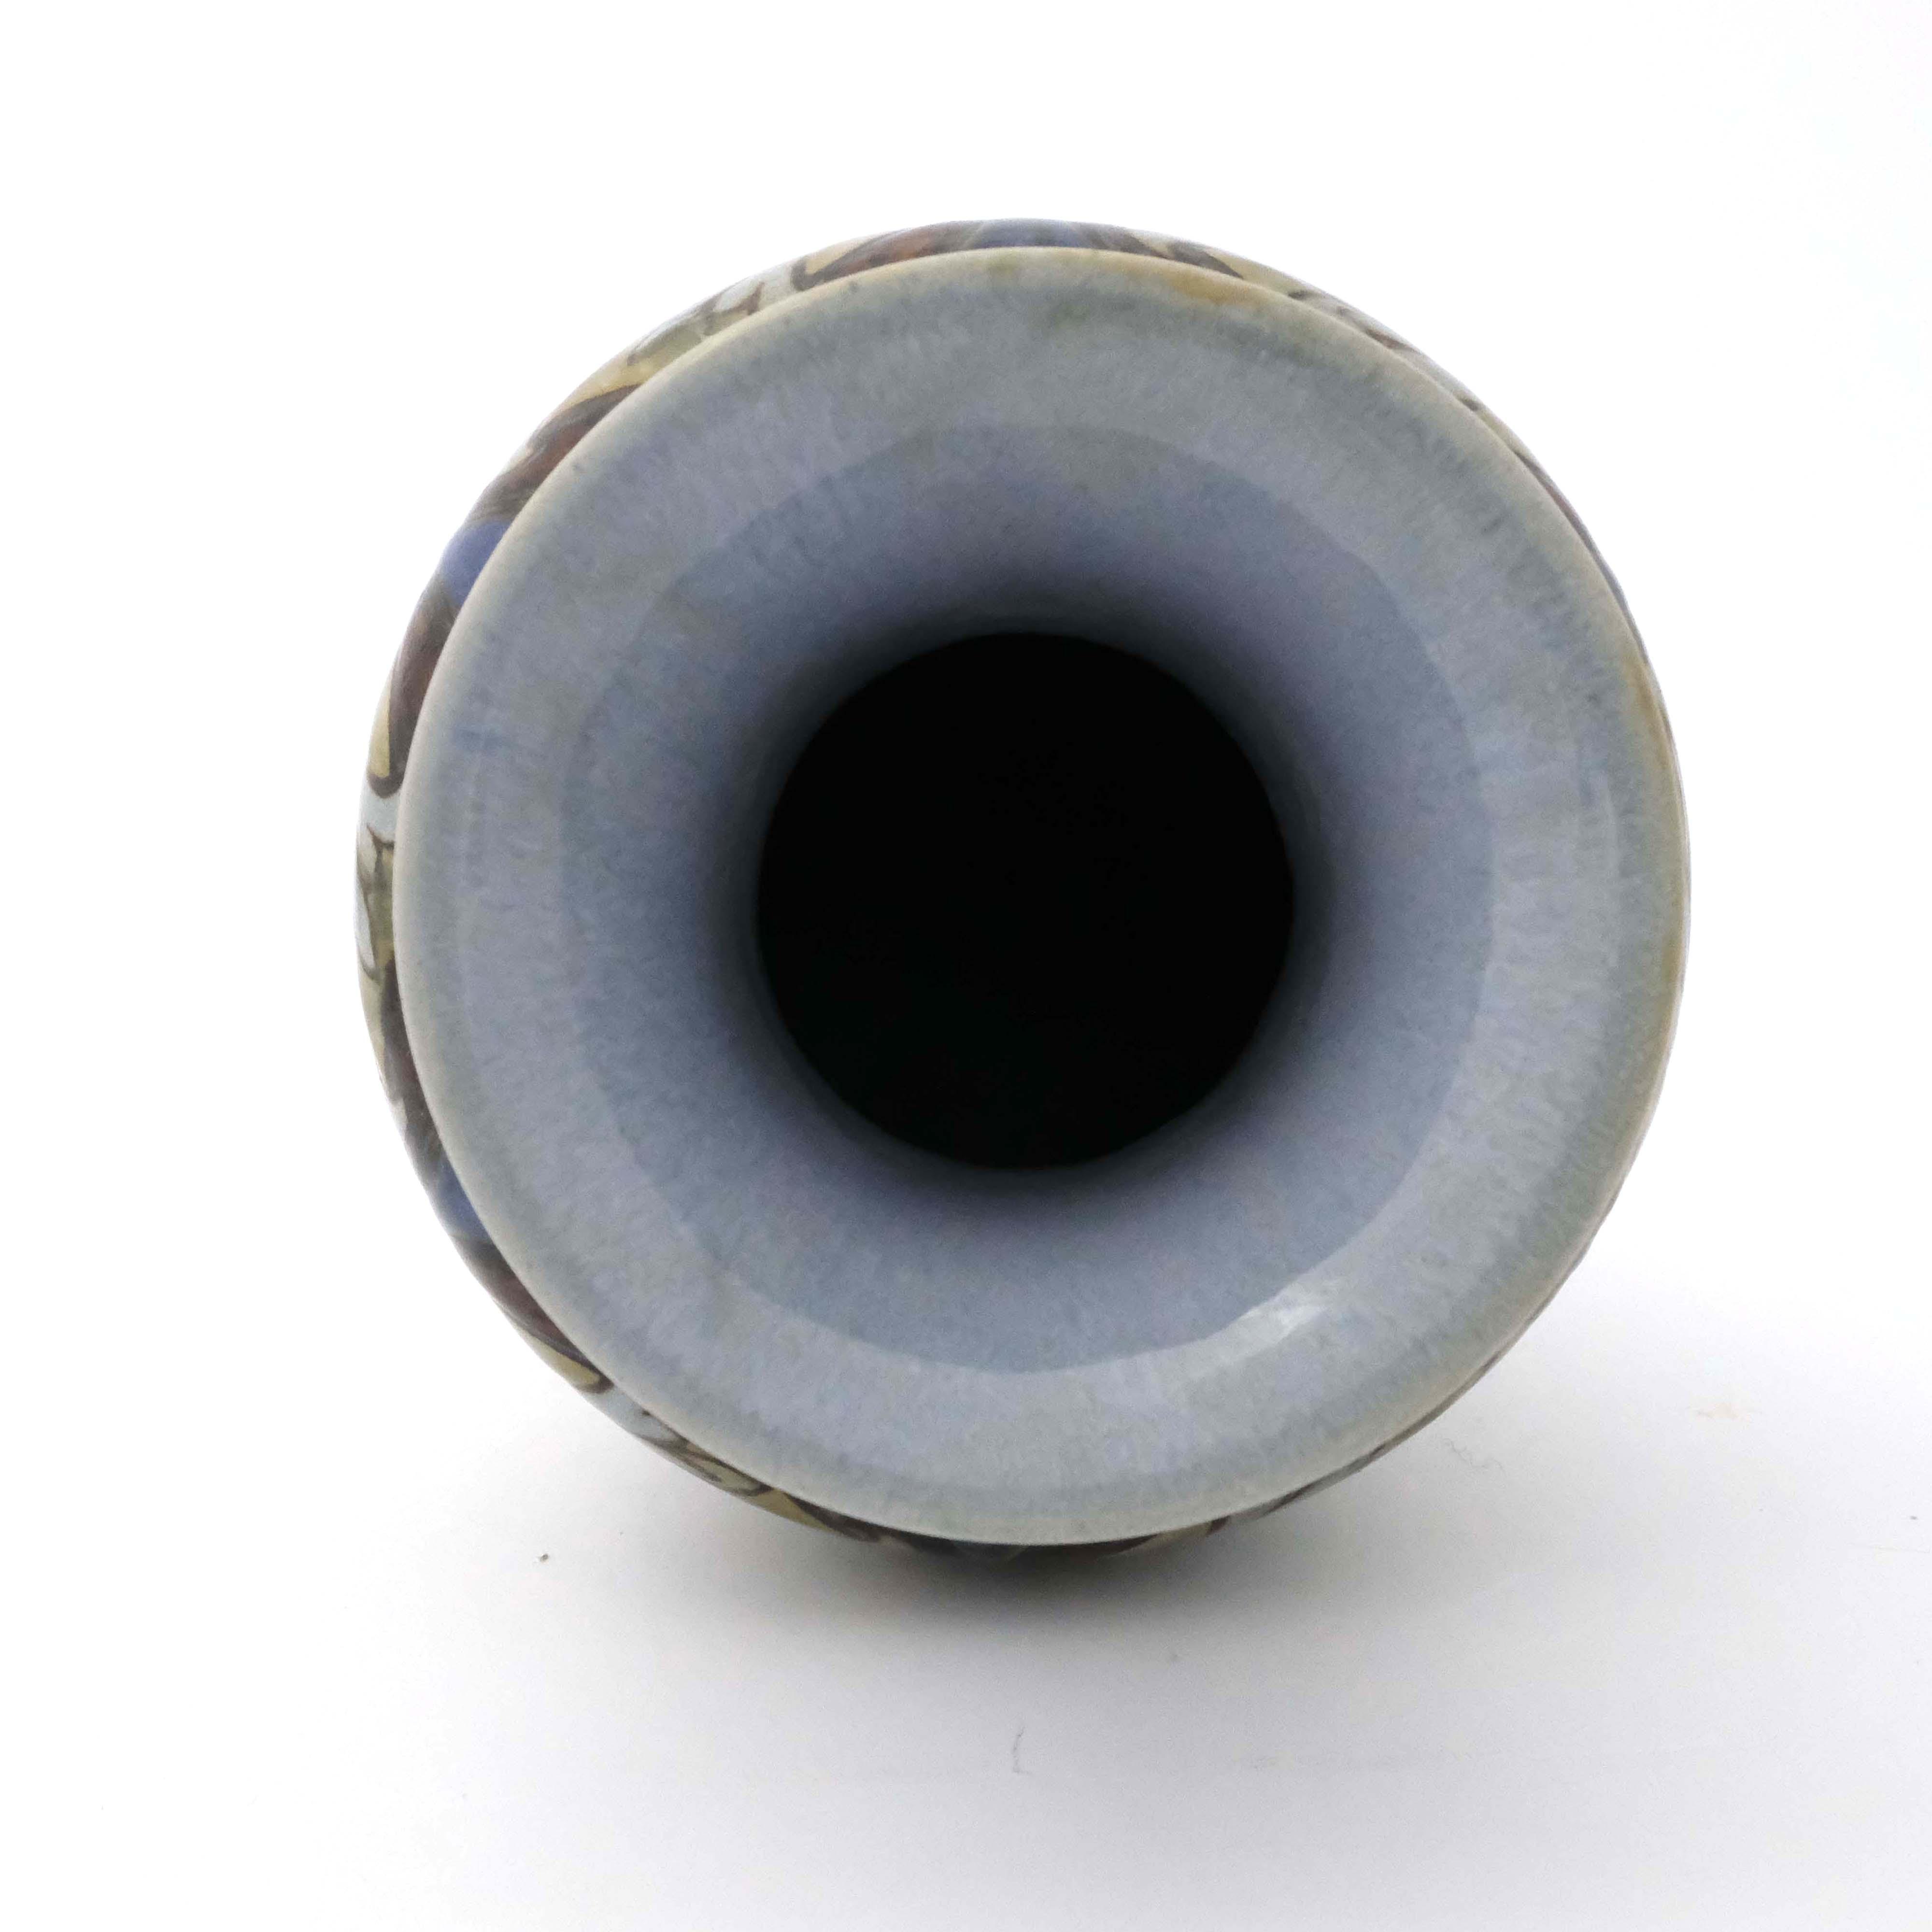 Eliza Simmance for Royal Doulton, a stoneware vase - Image 4 of 5